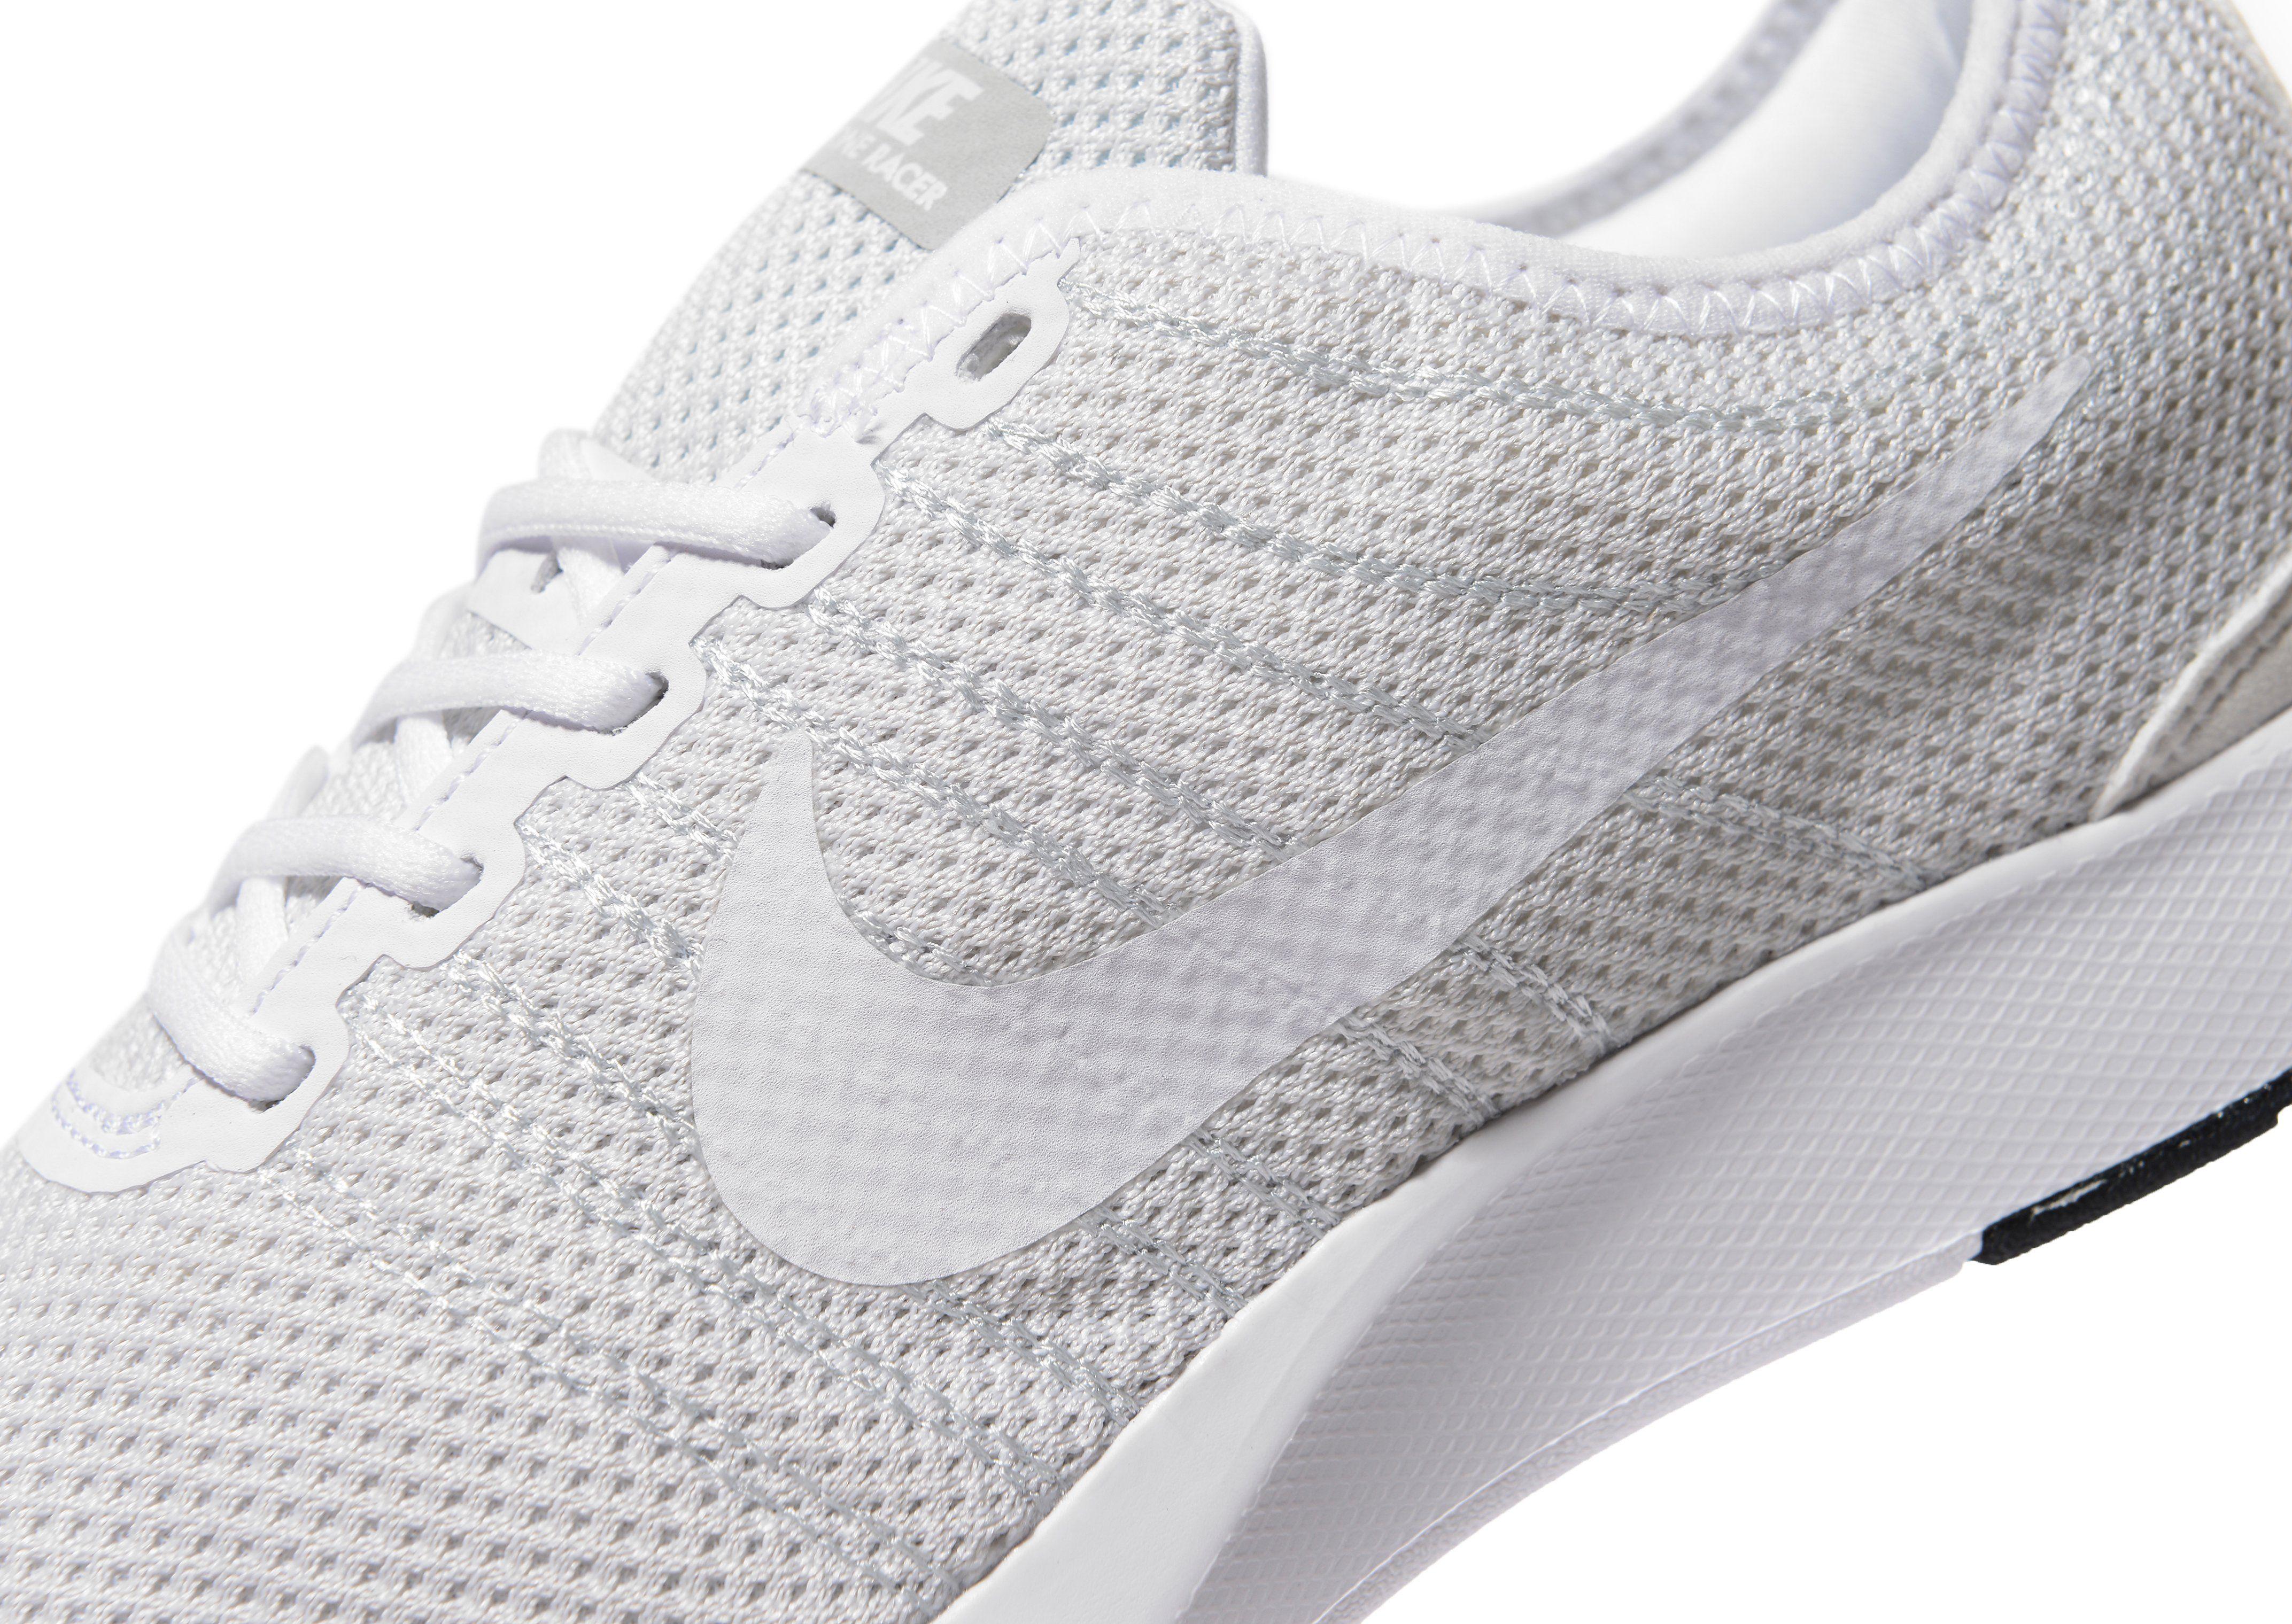 Nike DualTone Racer Junior Weiss Freiraum 100% Authentisch Bester Lieferant OQXu8p